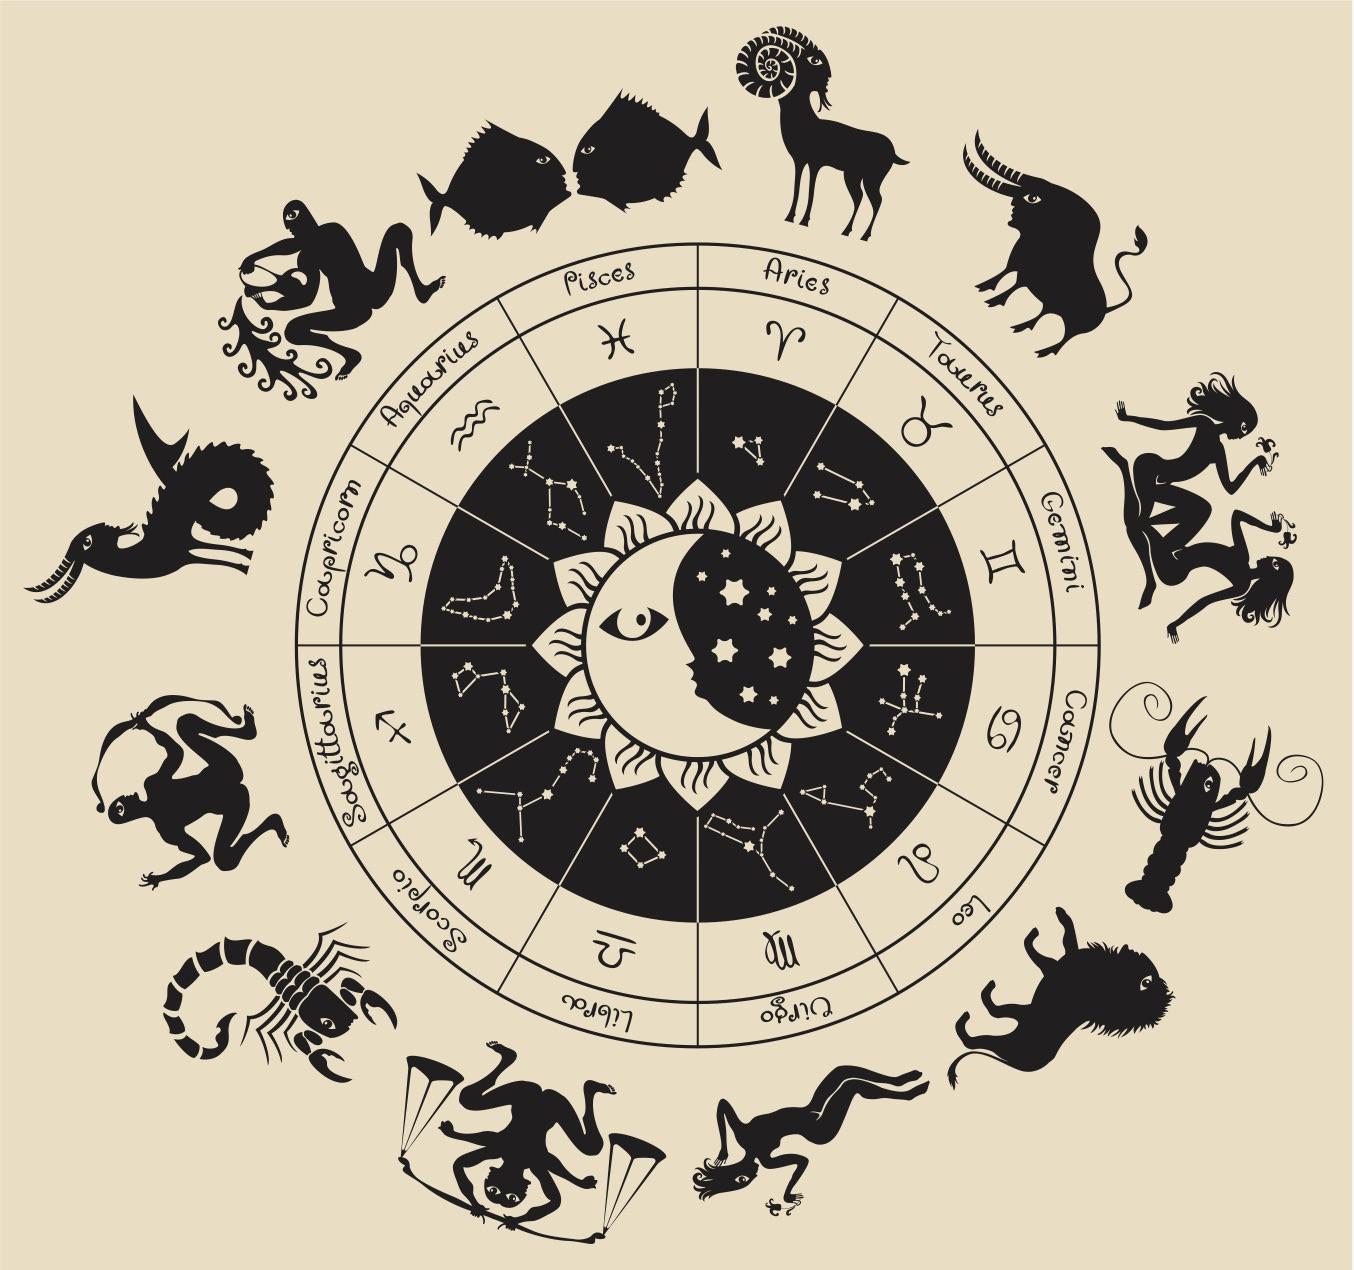 Aion Greek Mythological God Of Time